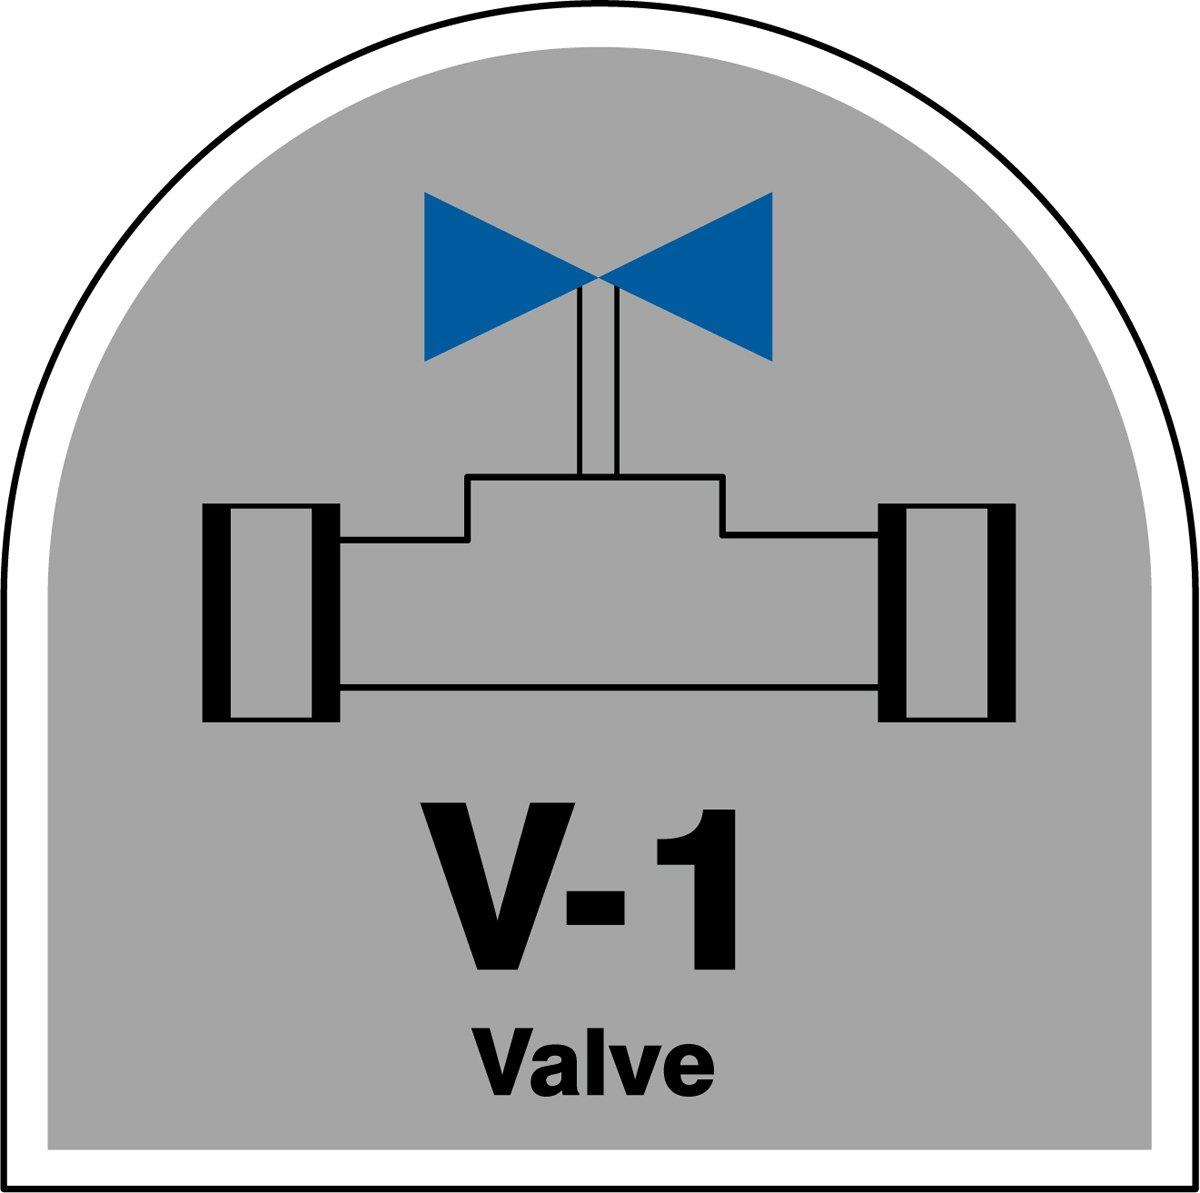 2-1//2 W x 2-1//2 L Black//Blue//White on Gray 2-1//2 W x 2-1//2 L Accuform TDJ201XVE Adhesive Dura-VinylV-1 Valve Energy Source Shape ID Tag